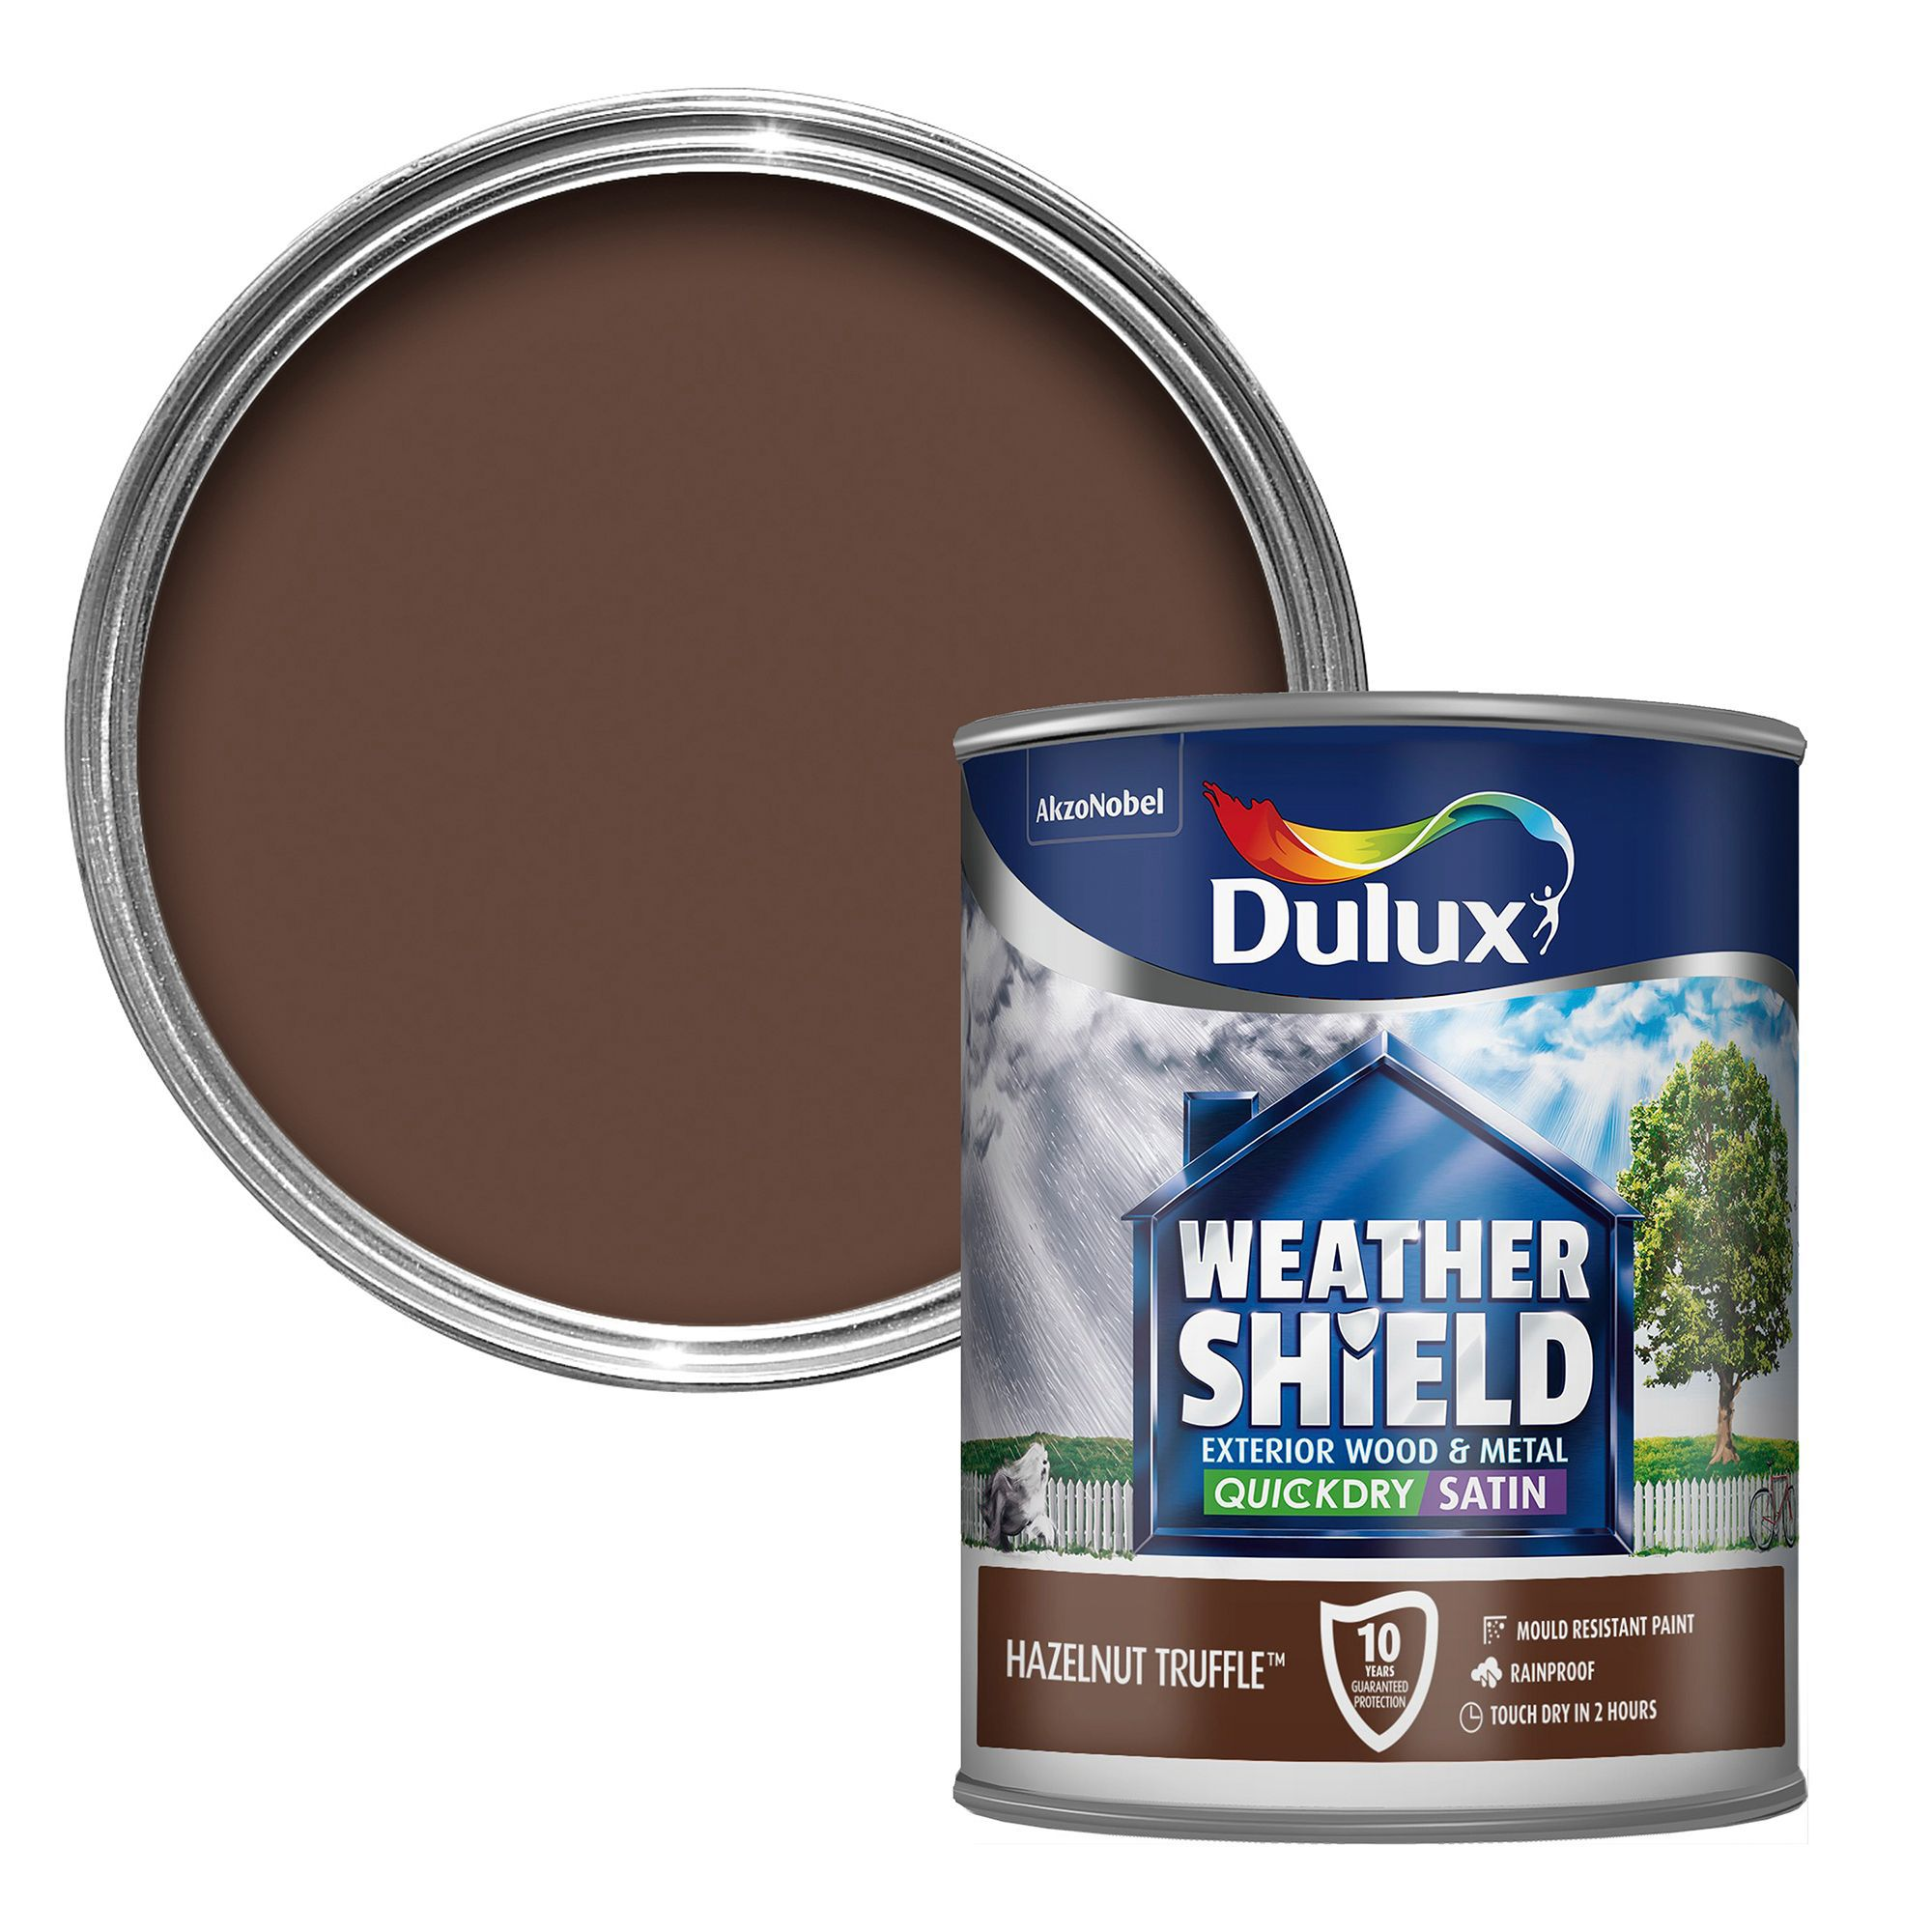 Dulux weathershield exterior hazelnut truffle satin wood metal paint 750ml departments diy - Exterior gloss paint for wood ideas ...